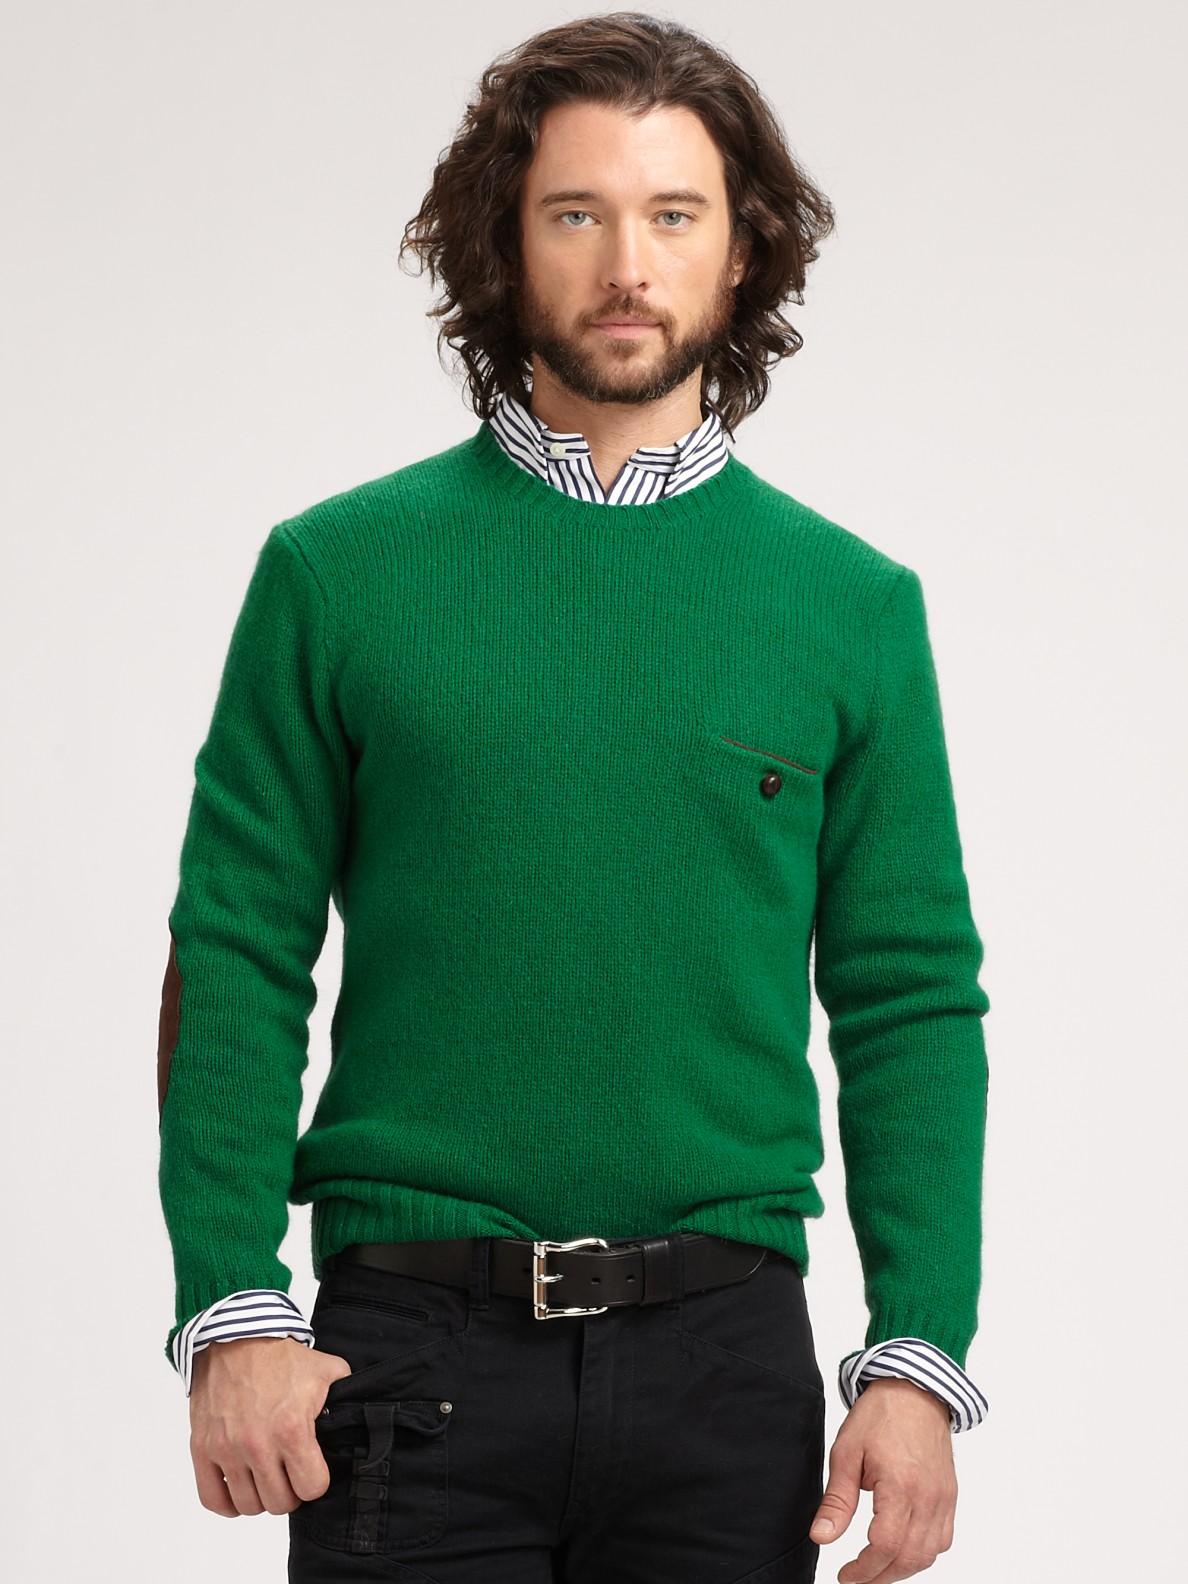 Polo ralph lauren Jersey Crewneck Sweater in Green for Men | Lyst